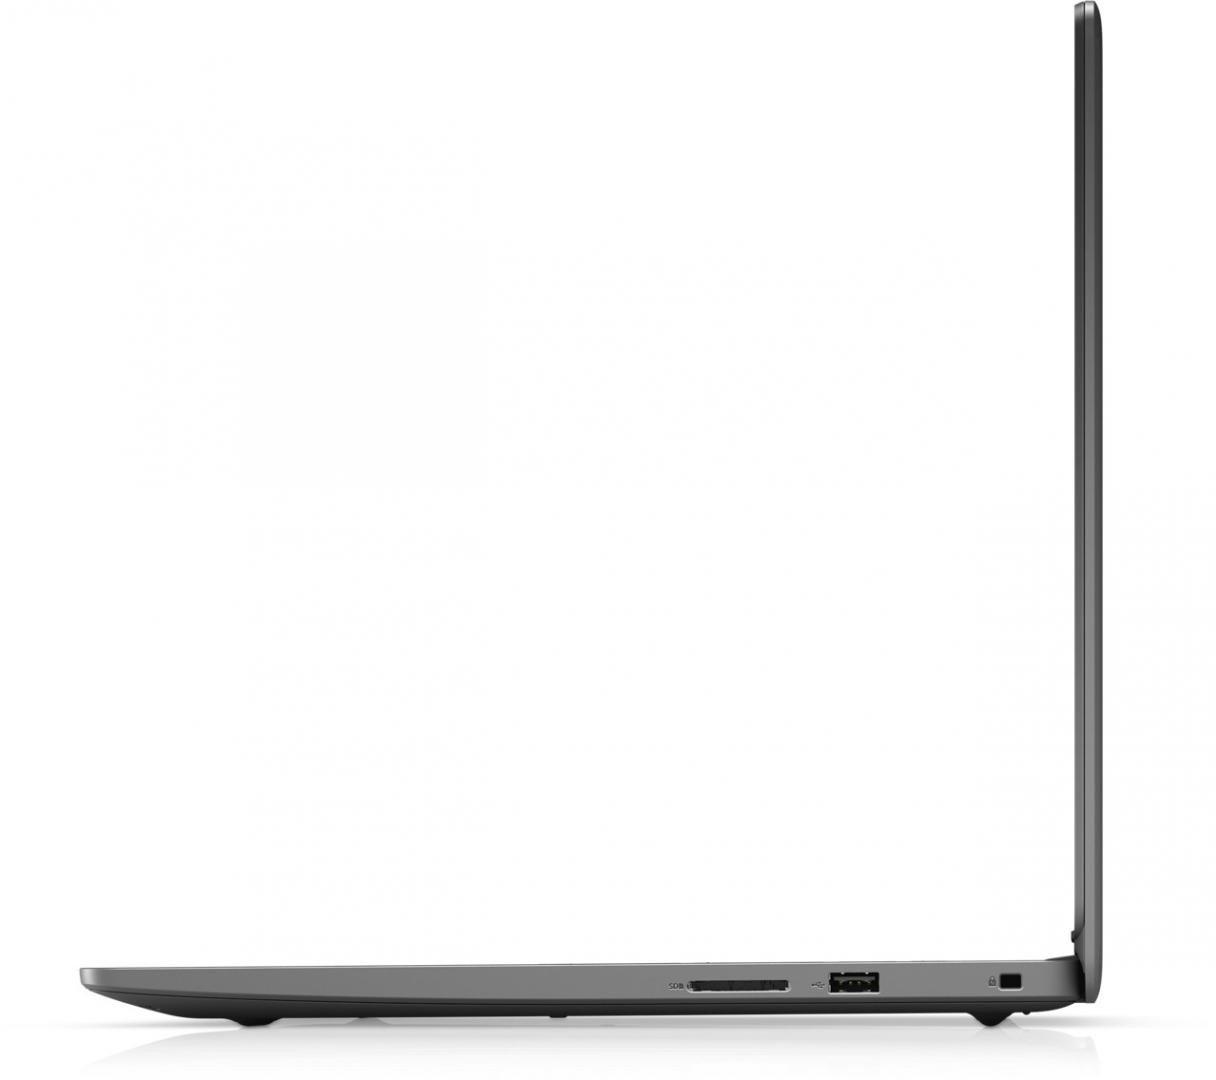 Laptop Dell Inspiron 3501, 15.6'' FHD, i3-1005G1, 8GB, 256GB SSD, Intel UHD Graphics, W10 Home S Mode - imaginea 4